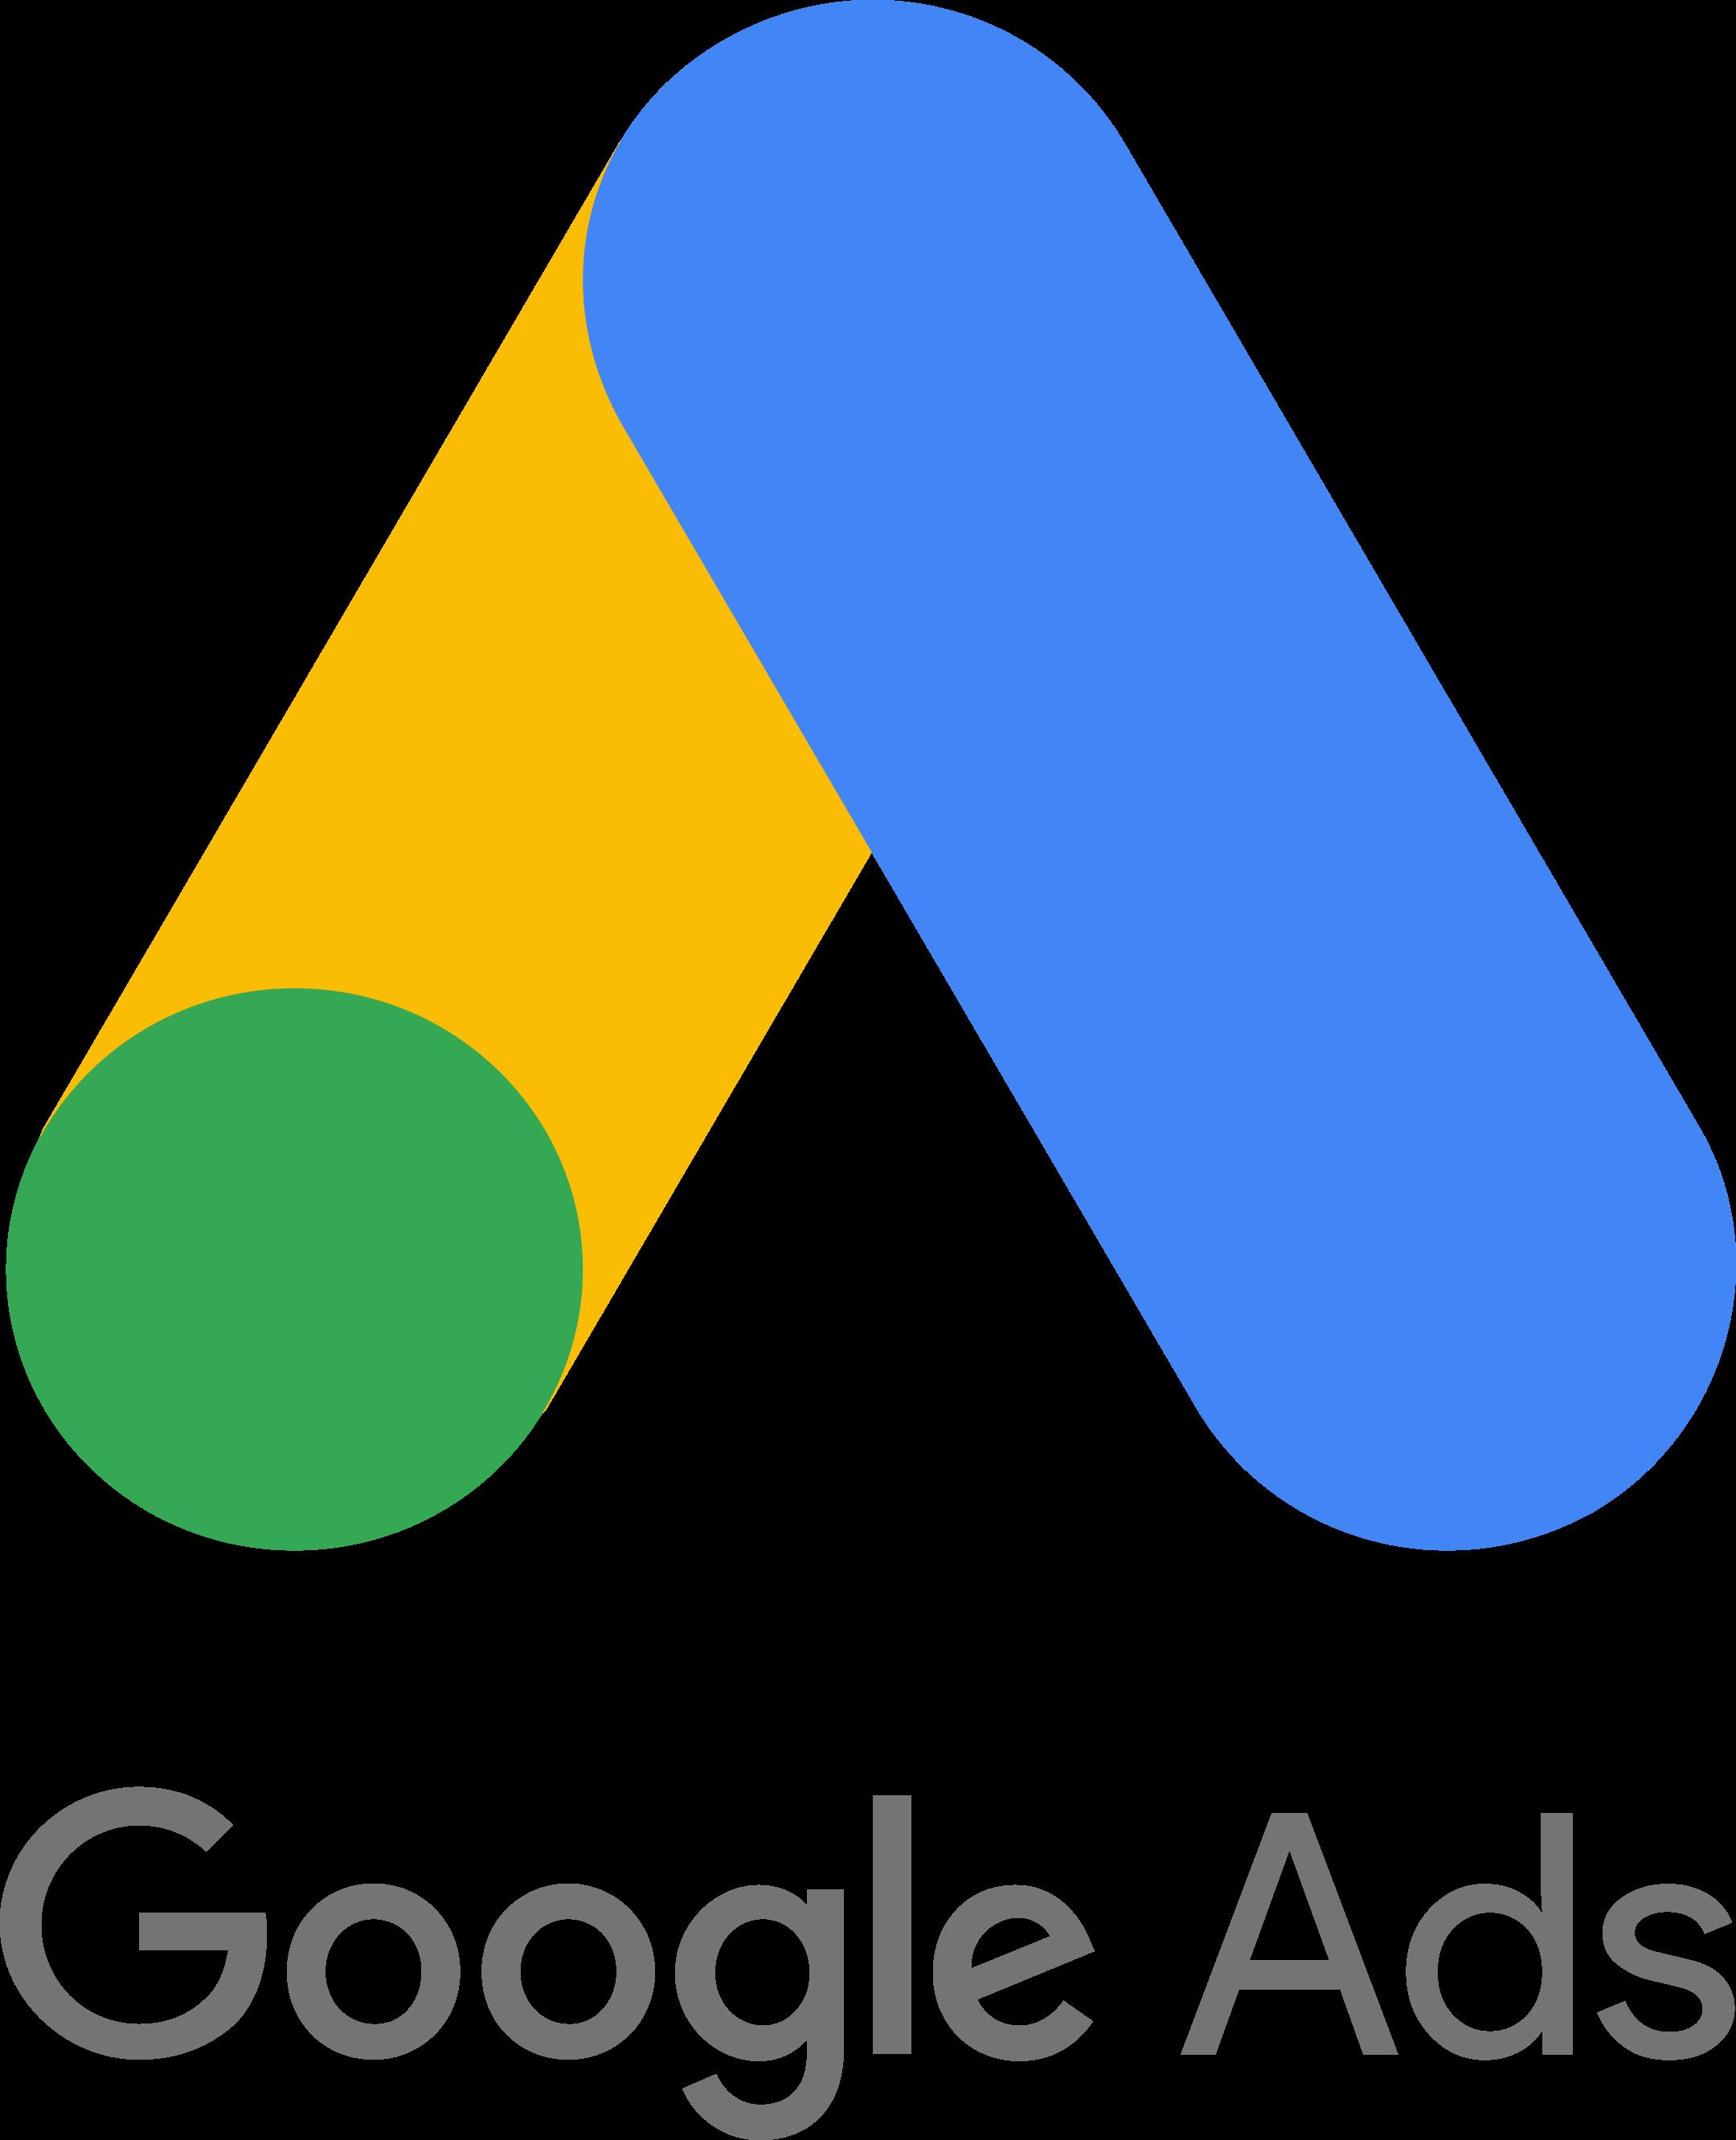 google adwords logo 6 - Google Ads Logo